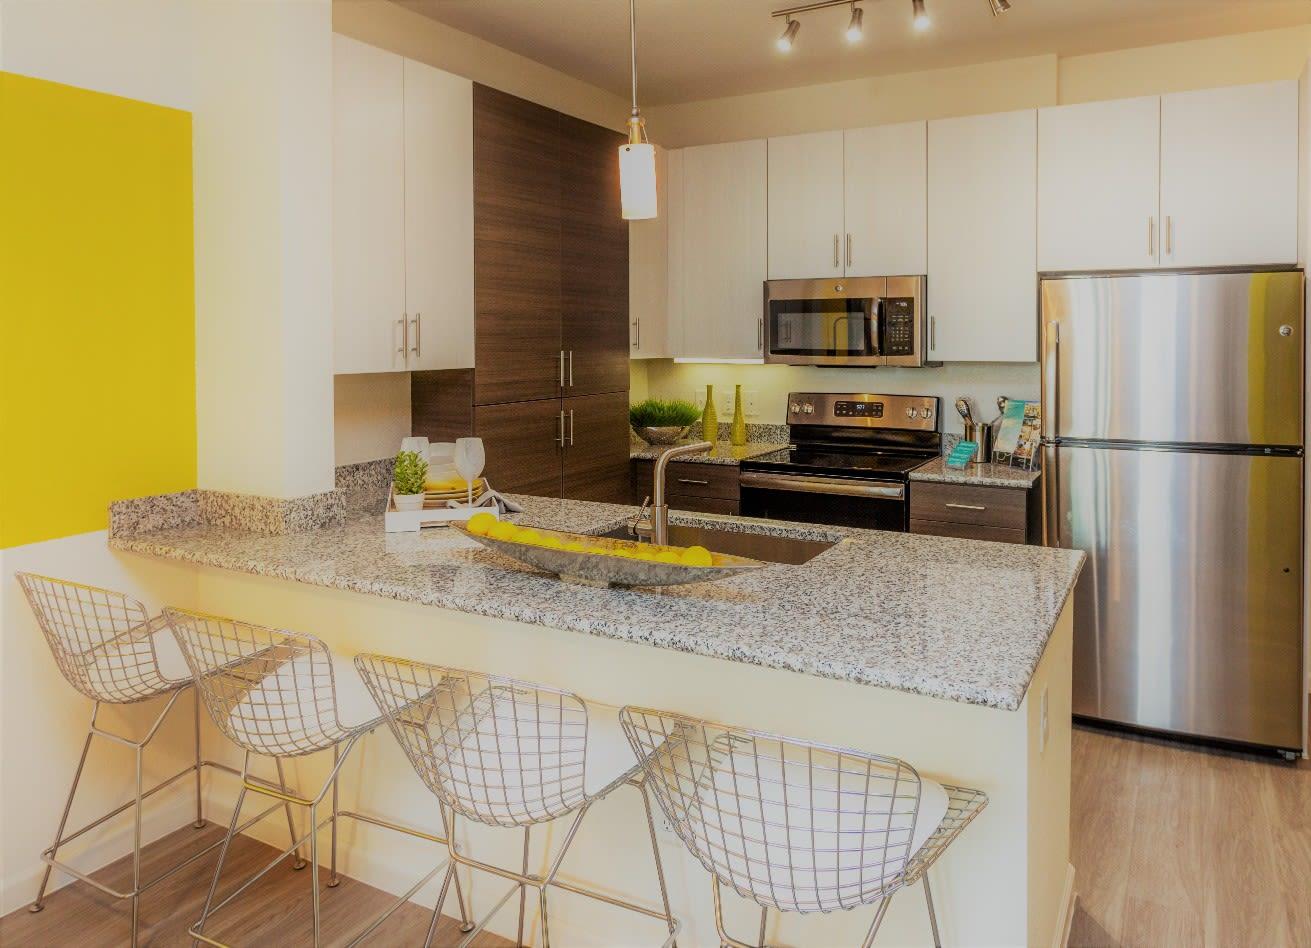 Kitchen Area at 50 Paramount Apartments in Tampa Florida